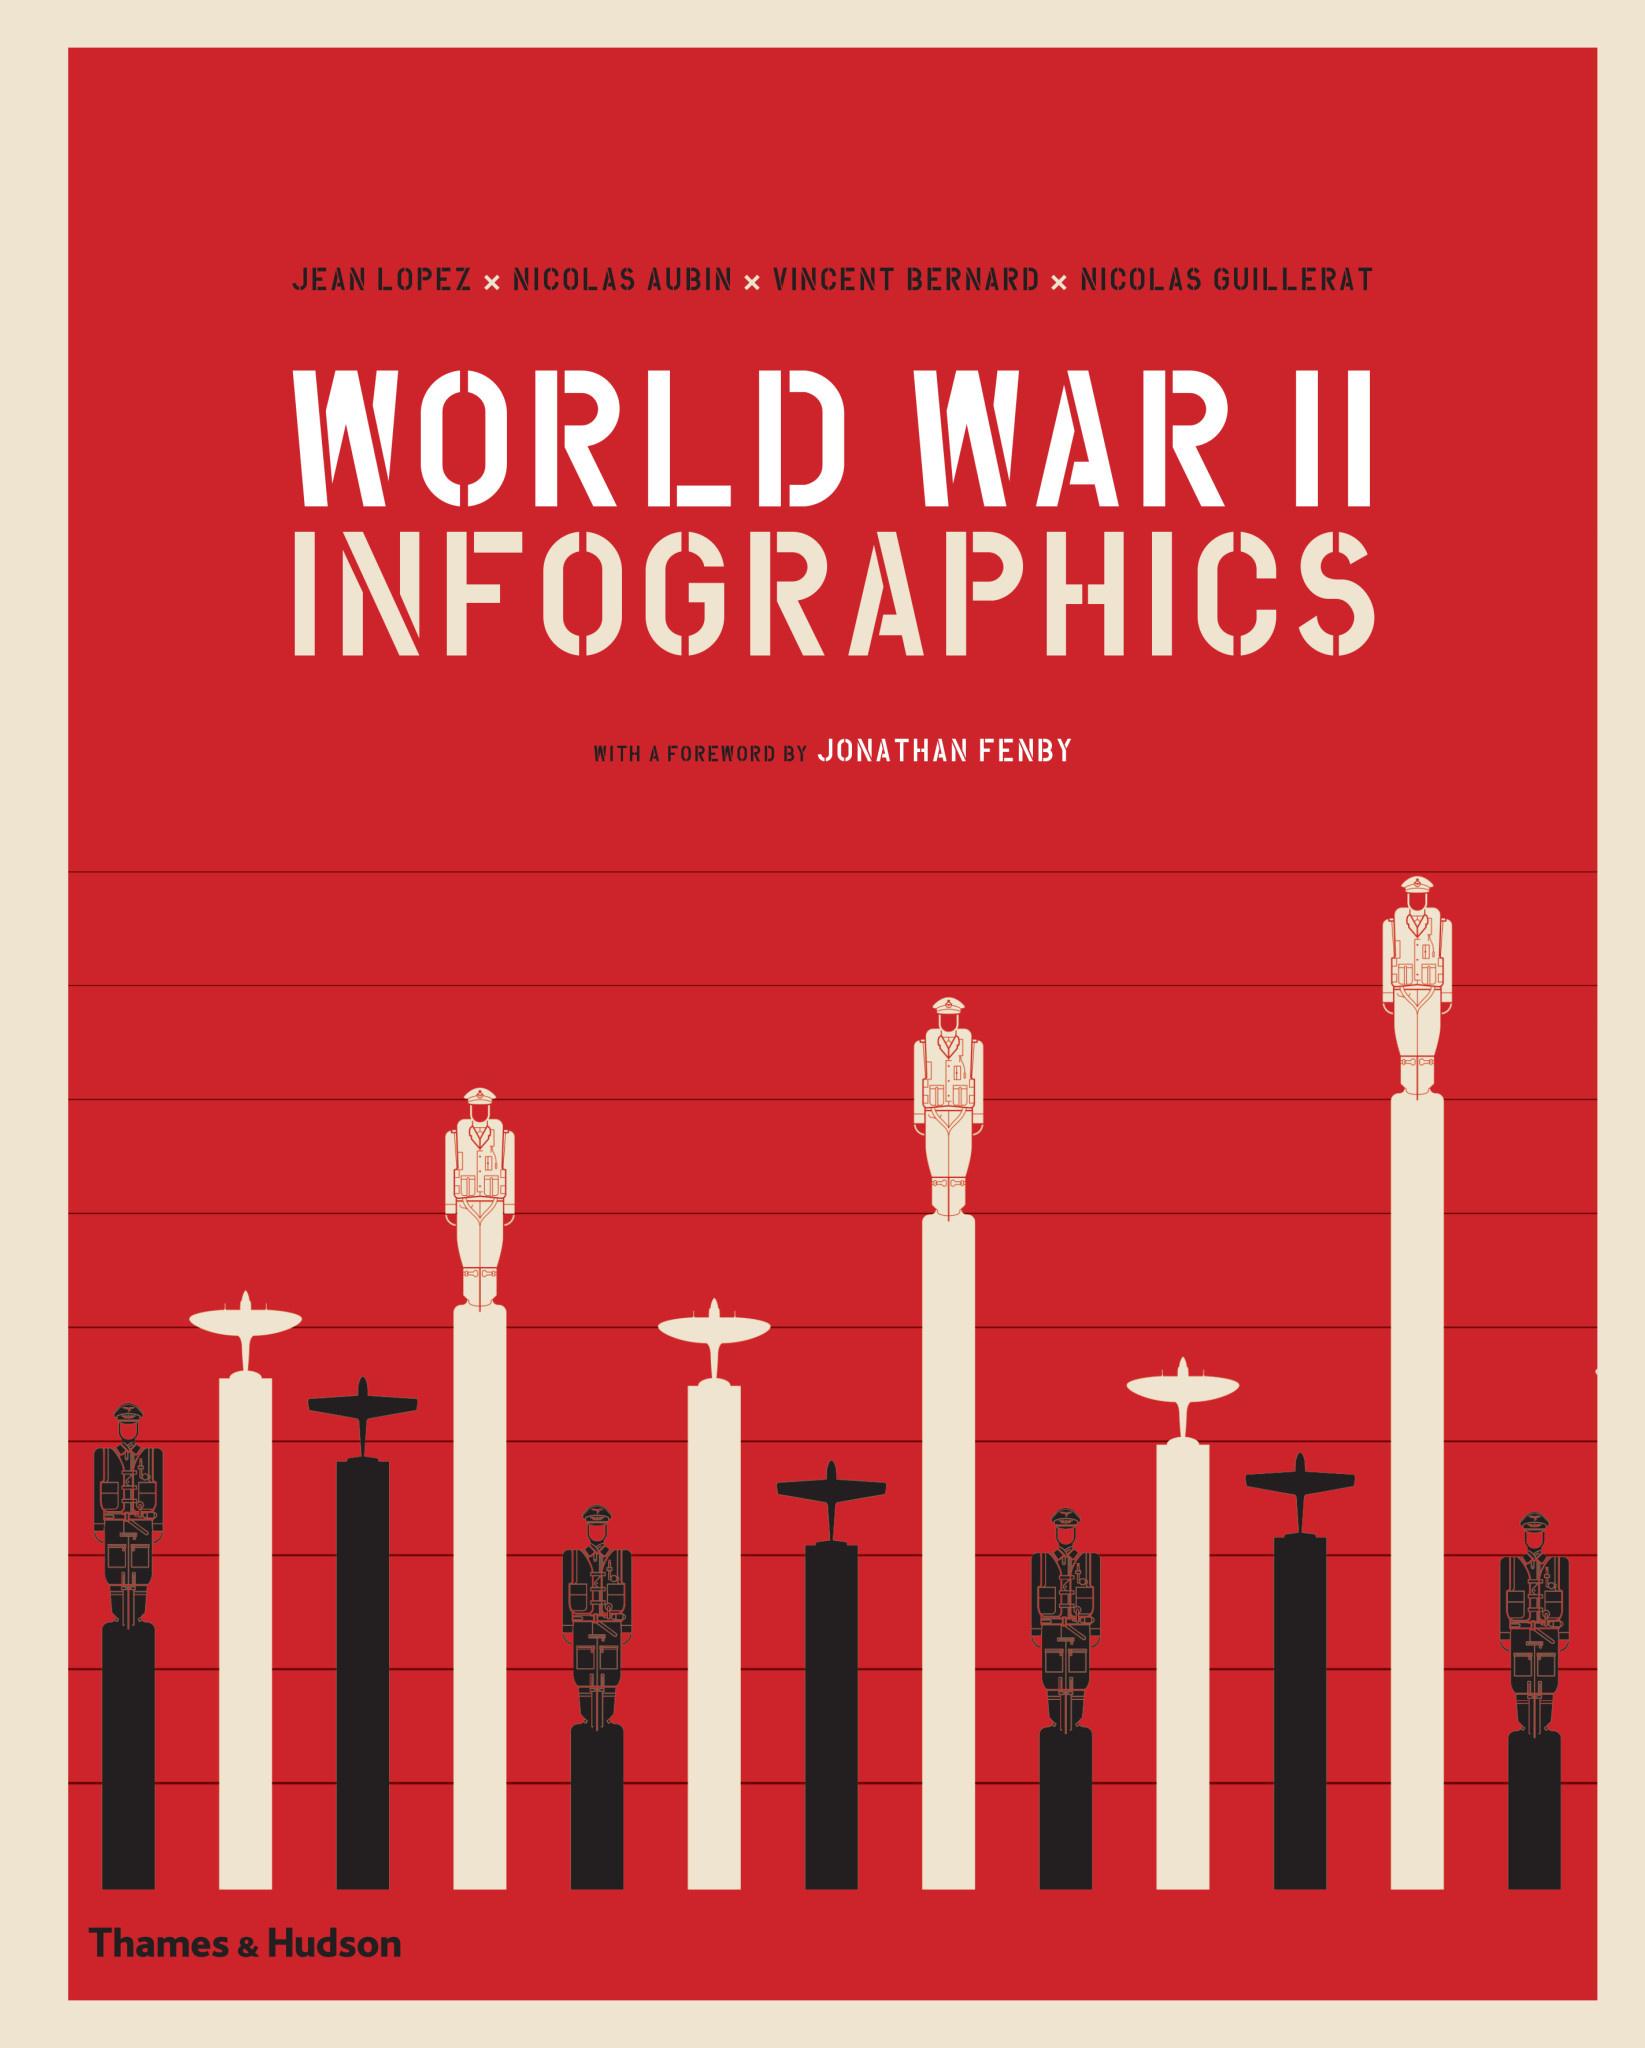 World War II Infographics Forword  Jonathan Fenby